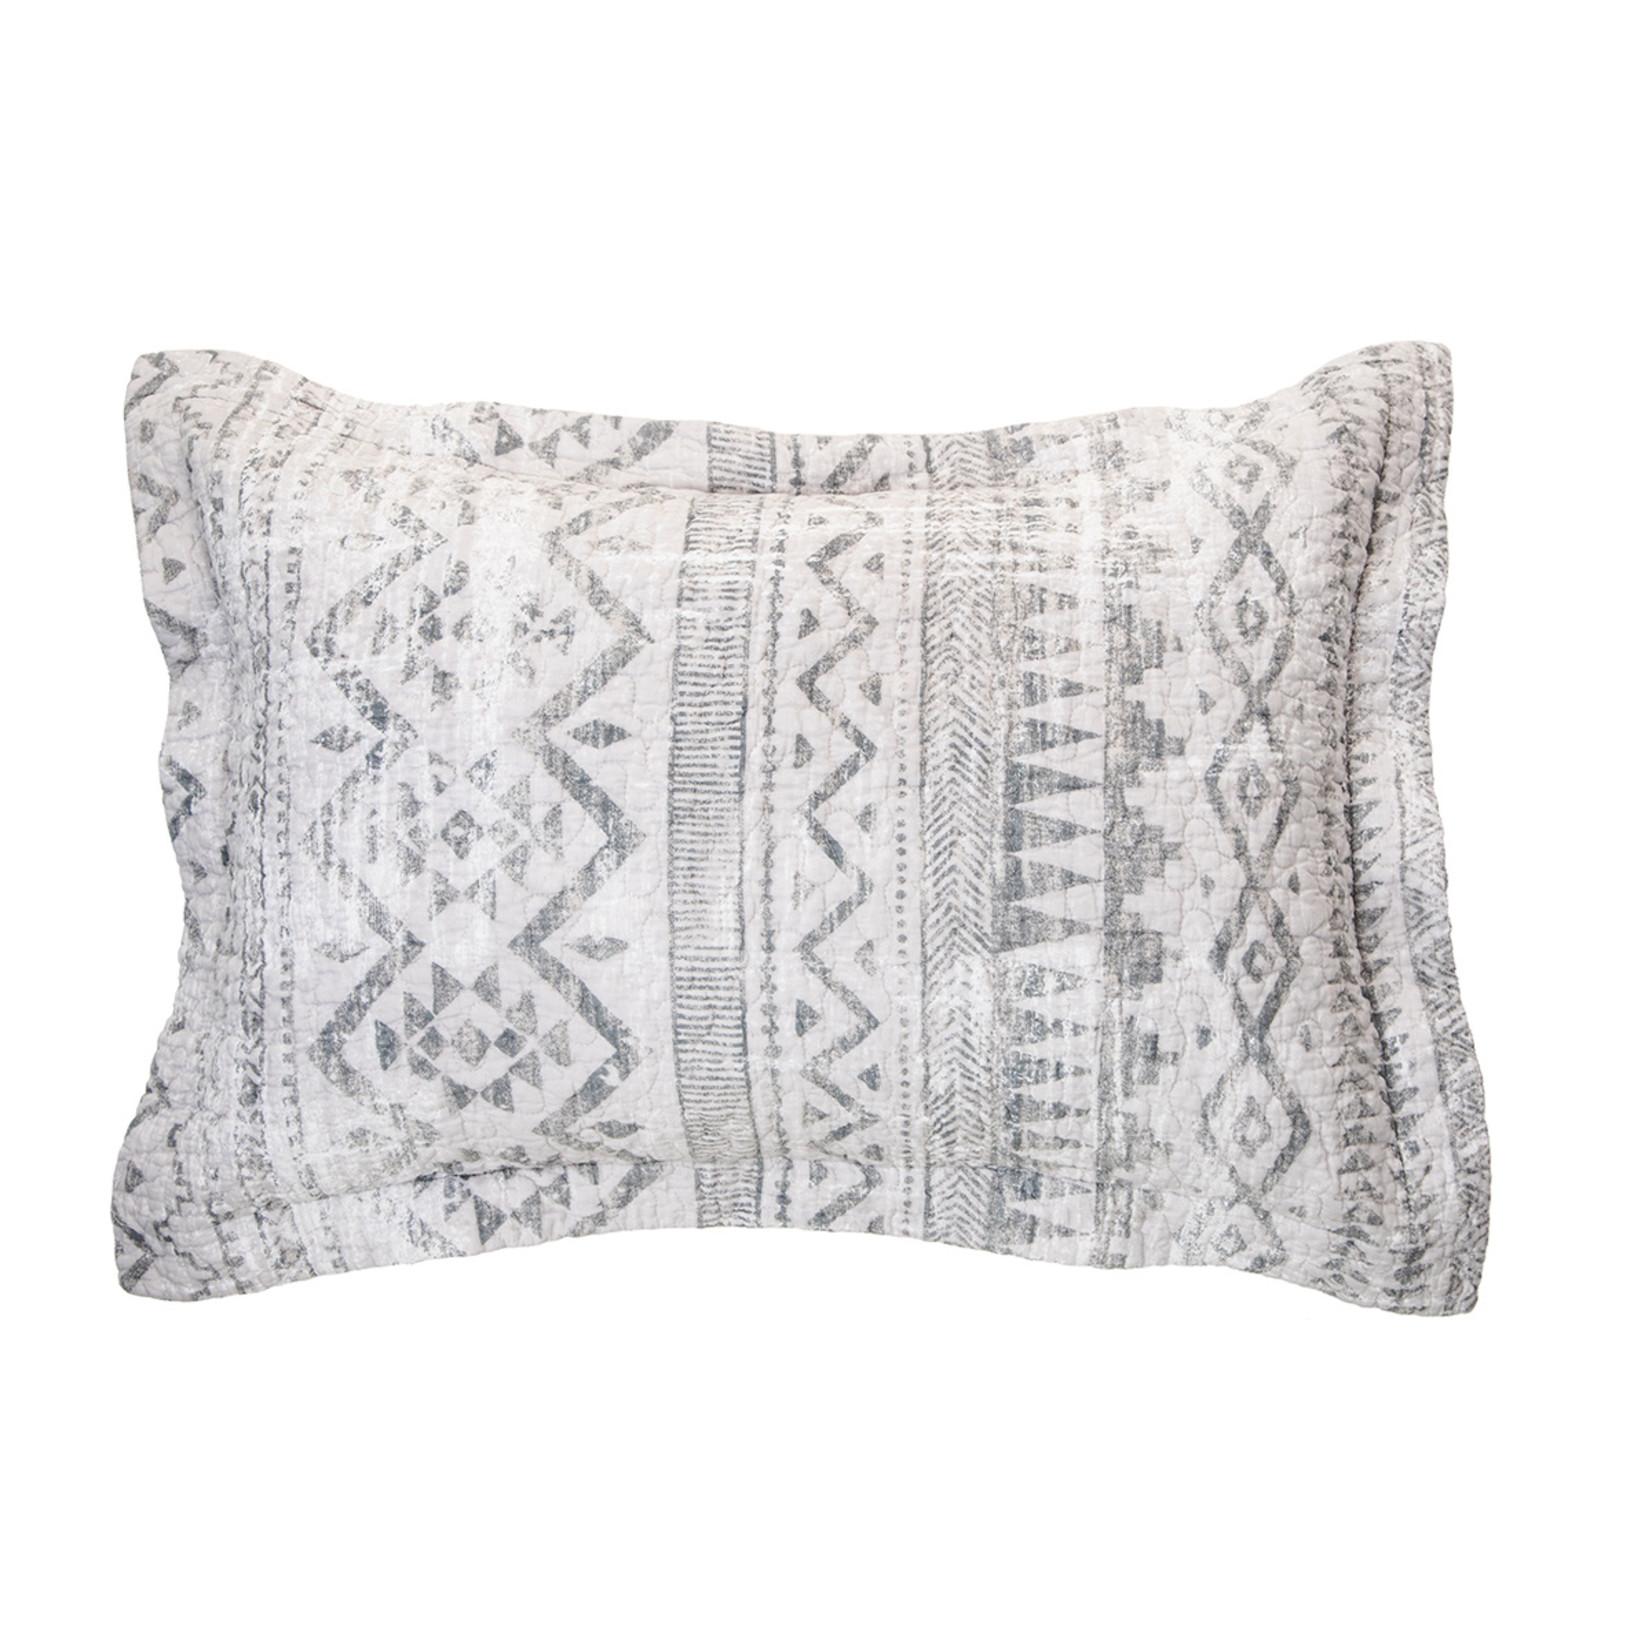 Brunelli Solveig Pillow Sham